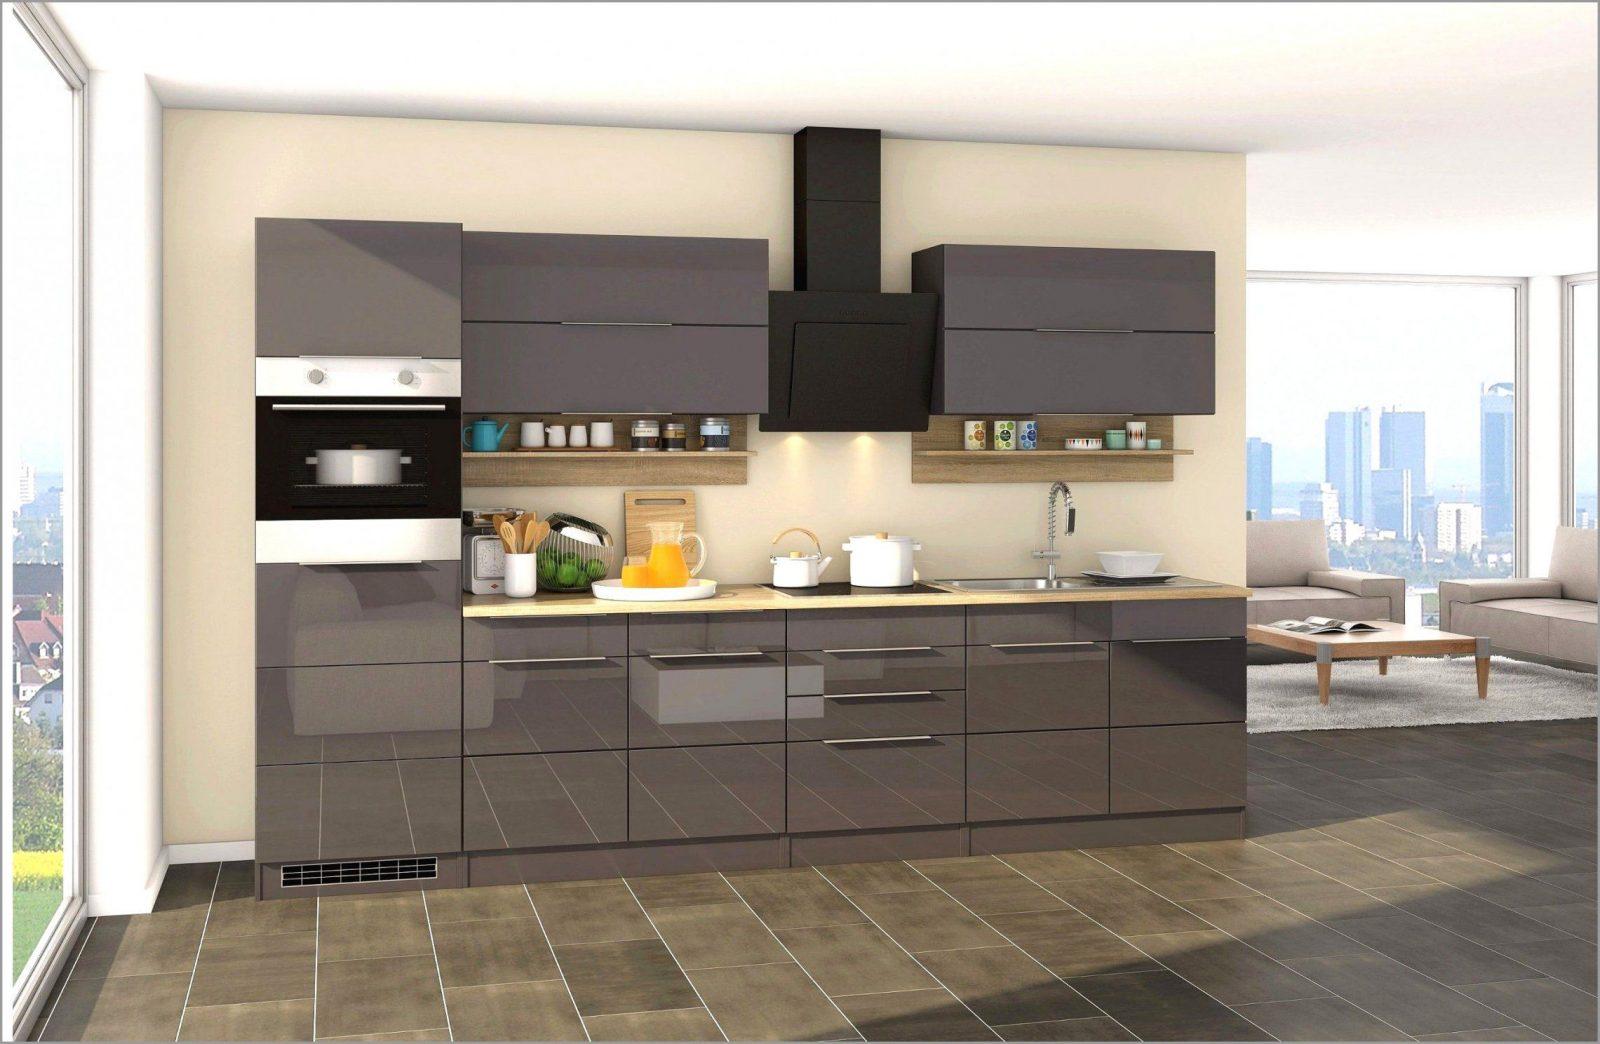 Full Size of Küchenrückwand Poco Big Sofa Bett 140x200 Schlafzimmer Komplett Küche Betten Wohnzimmer Küchenrückwand Poco